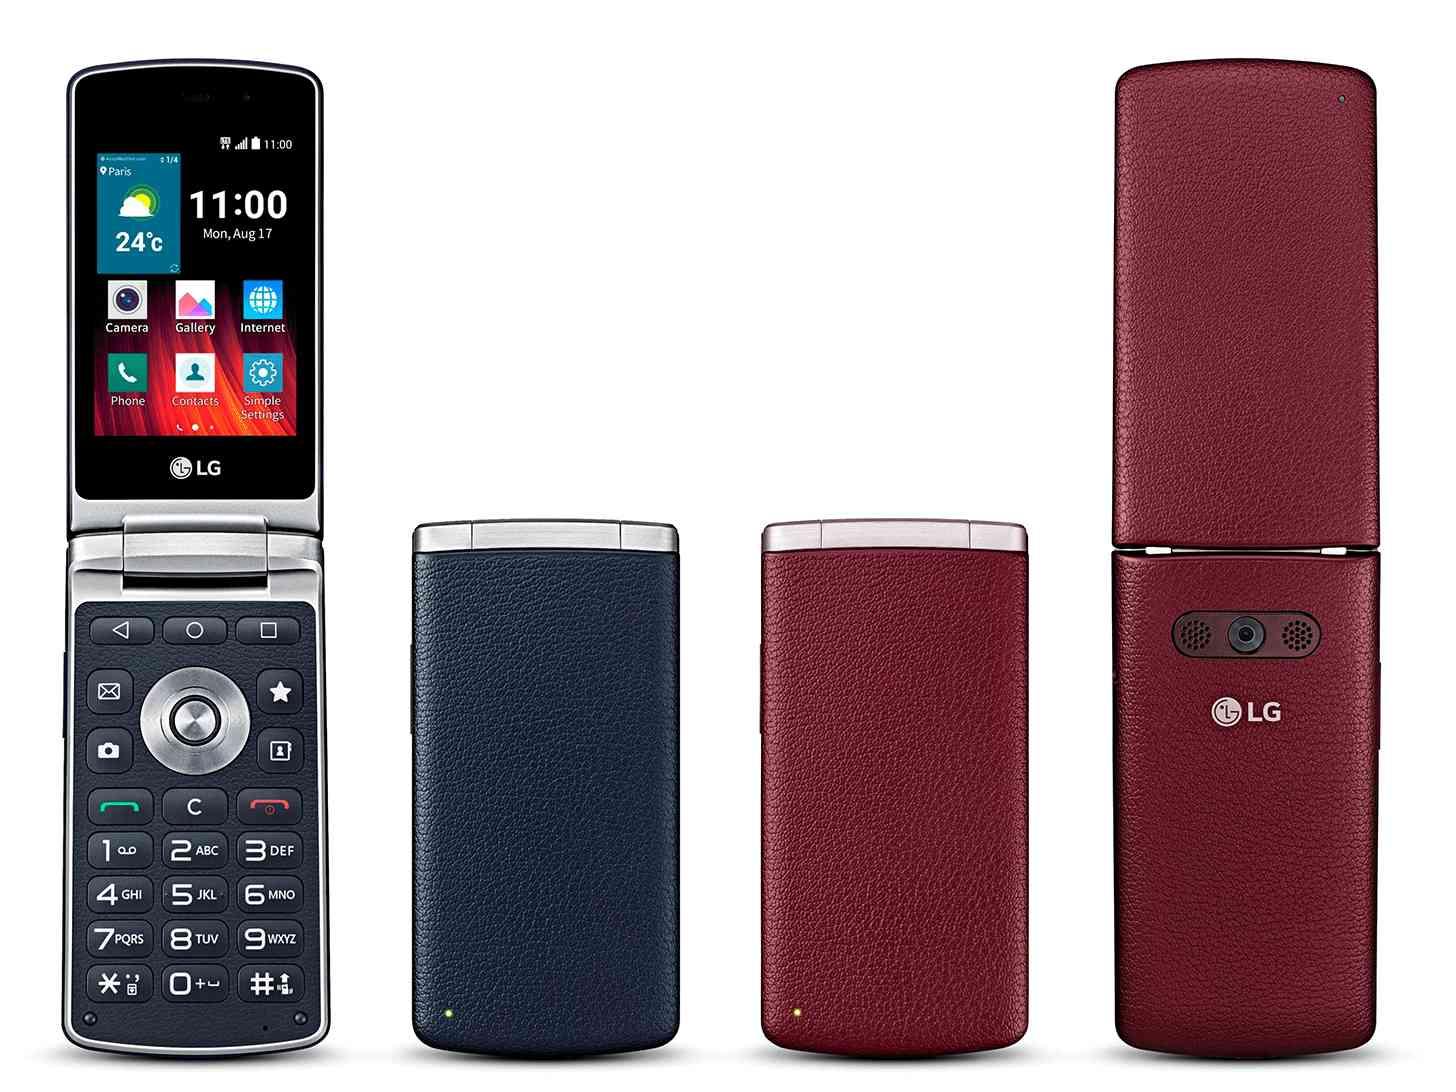 LG Wine Smart Android flip phone